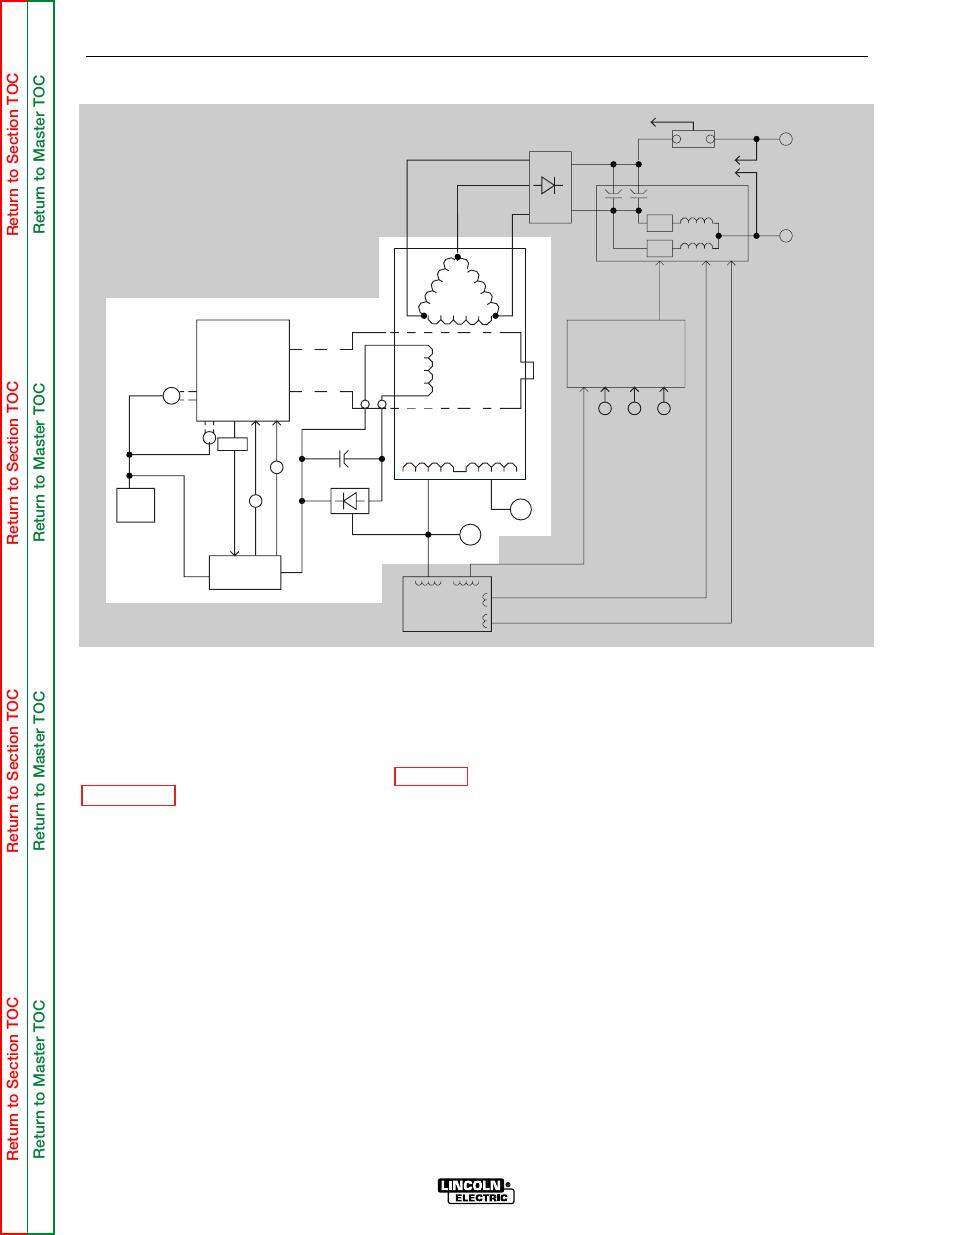 Lincoln Sa200 Wiring Diagrams Best Secret Diagram Sa 200 Welder Remote Alternator Wire Se200